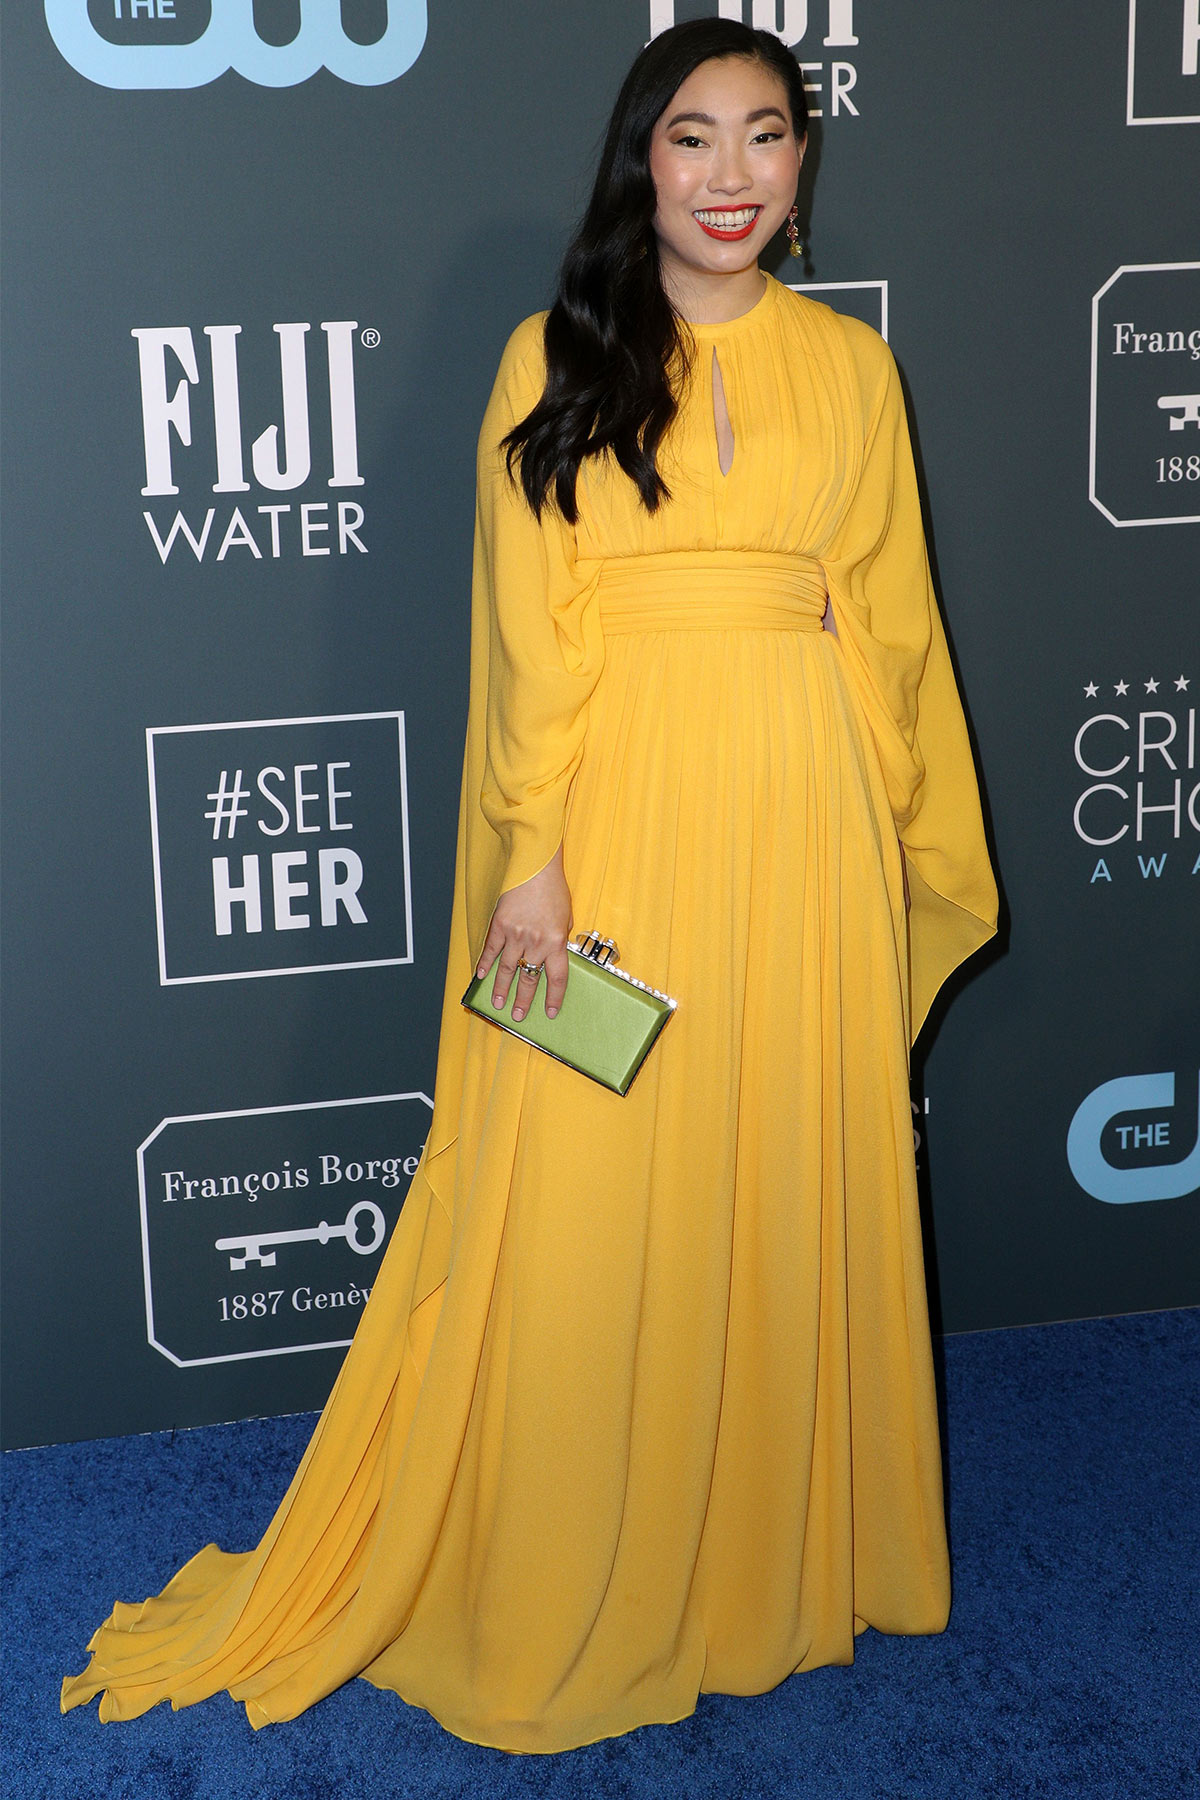 25th Annual Critics' Choice Awards, Arrivals, Fashion Highlights, Barker Hanger, Los Angeles, USA - 12 Jan 2020